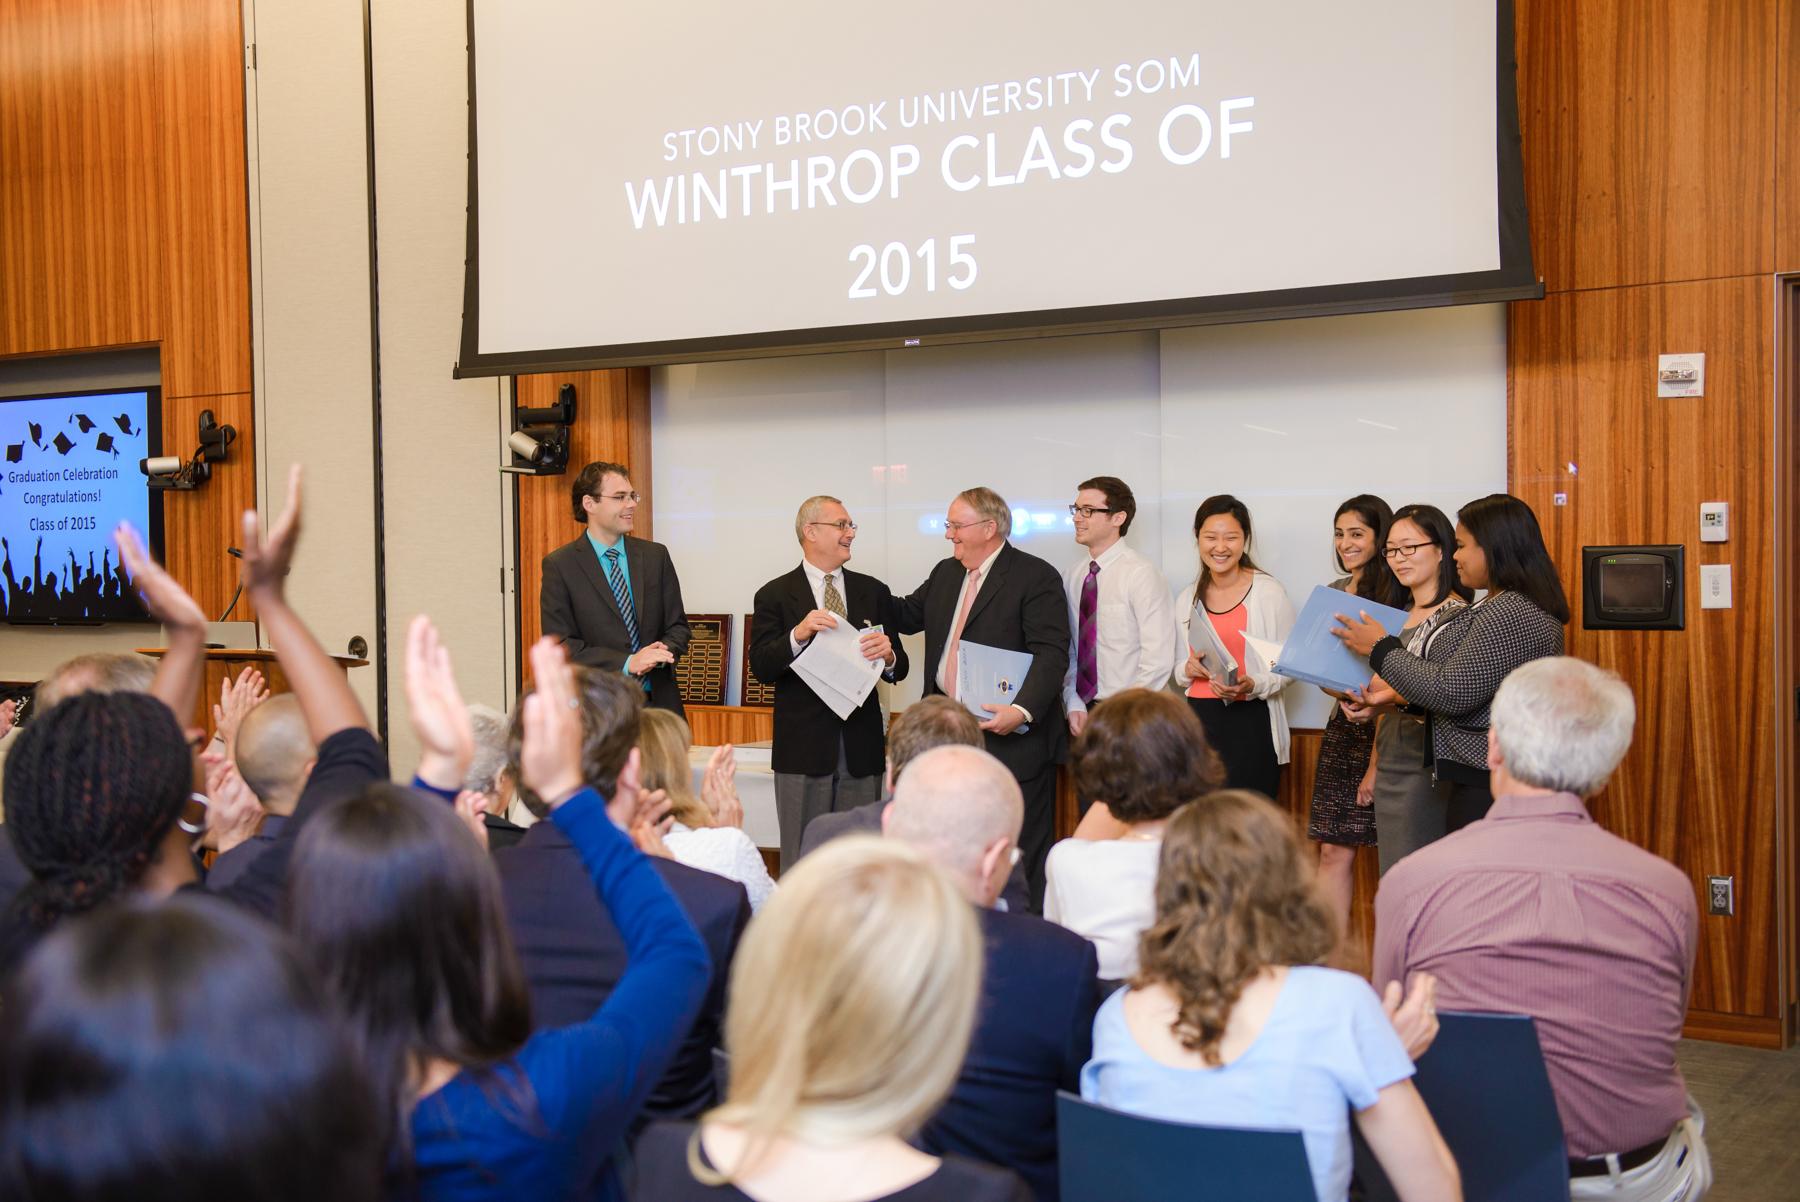 Winthrop_Graduation-102.jpg